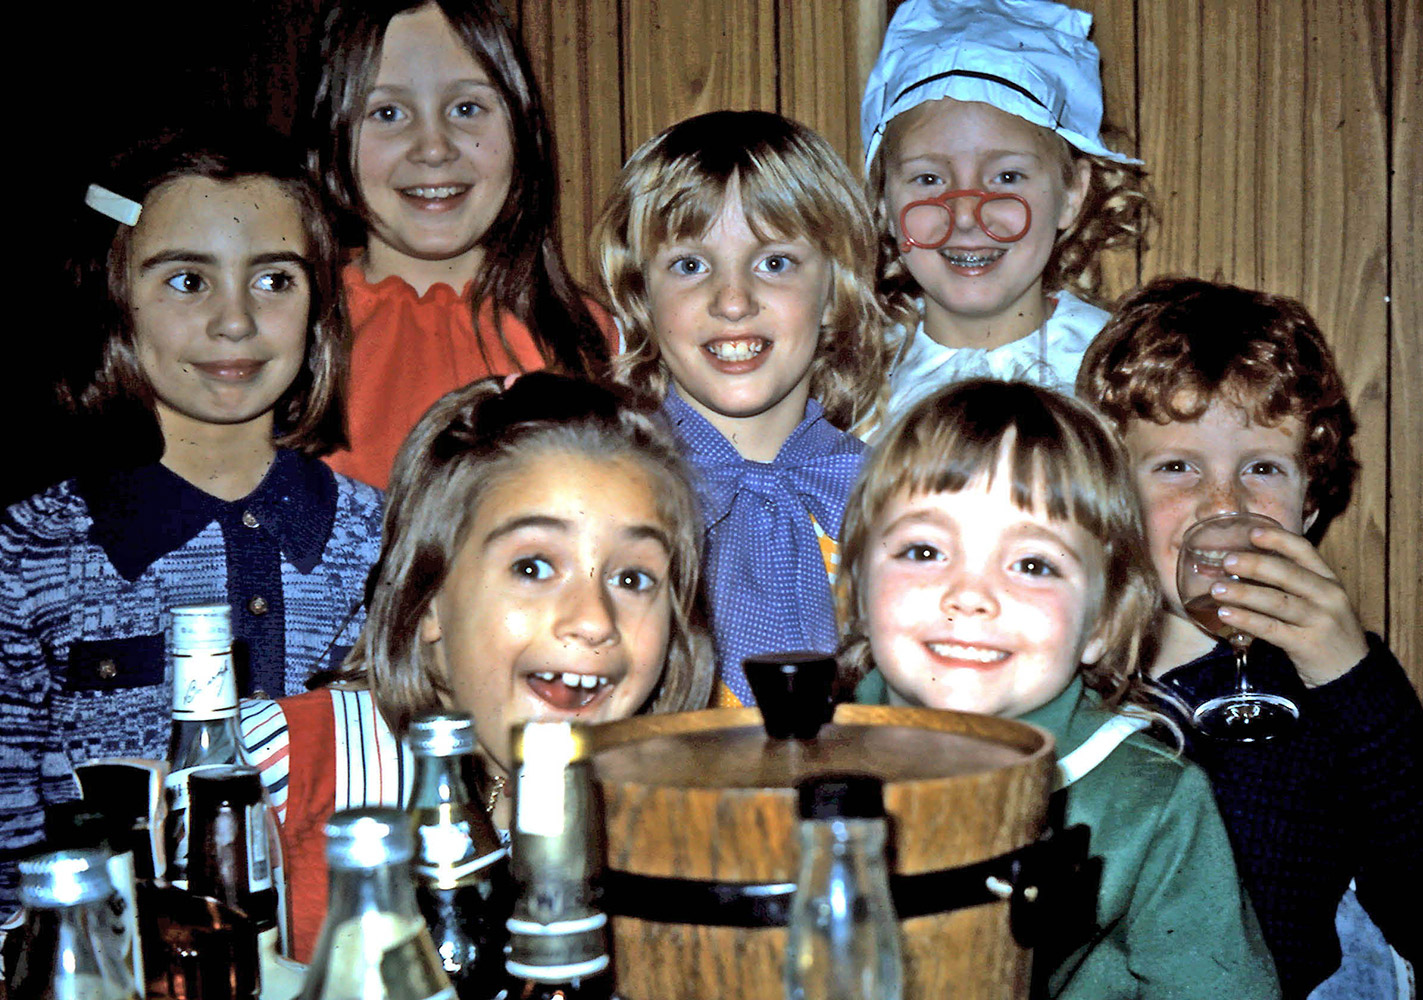 Children With Booze